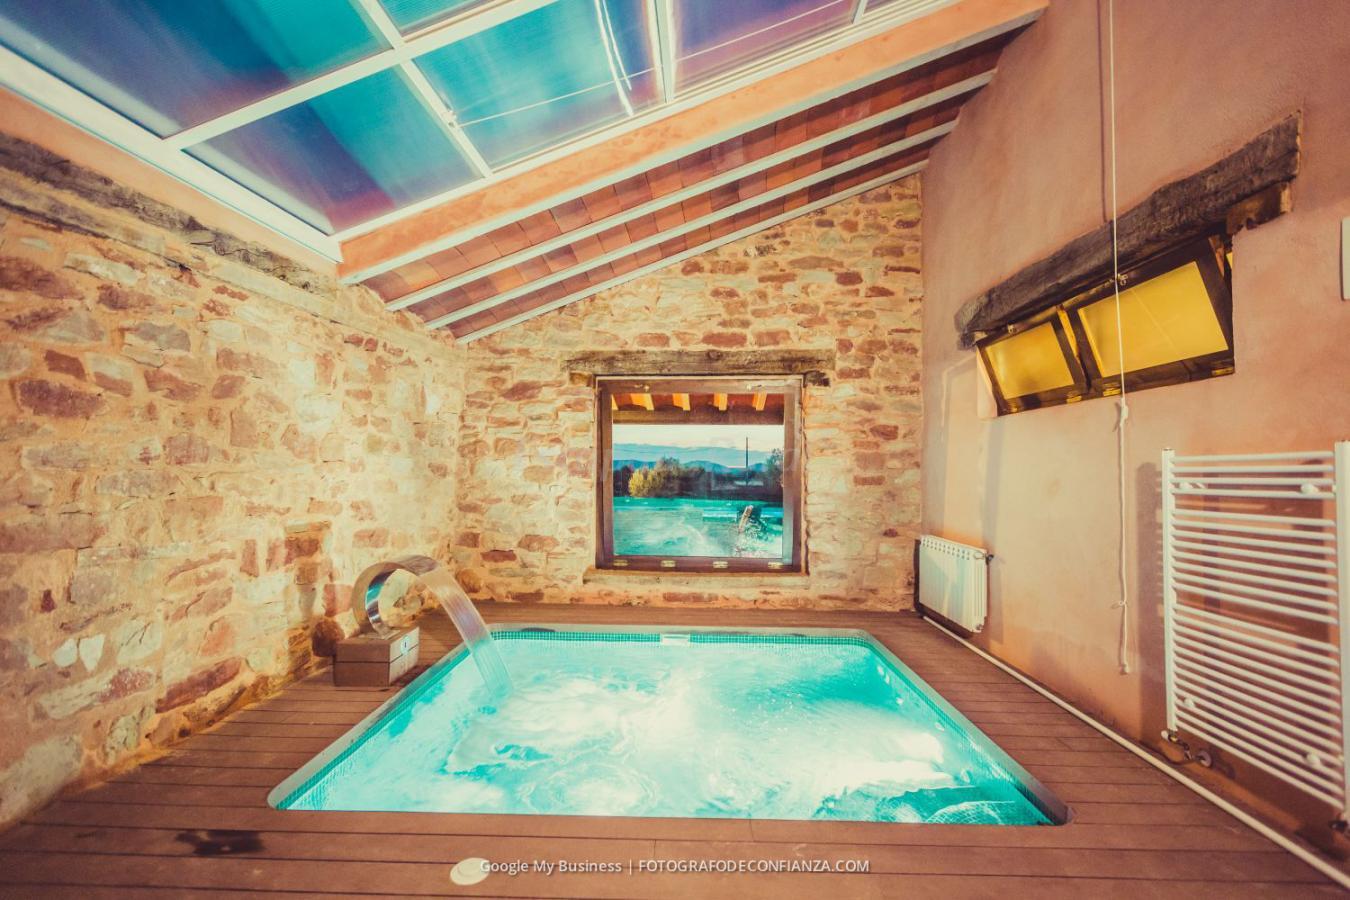 Fotos de finca spa vereda real casa rural en alcaraz - Casas con piscina interior ...